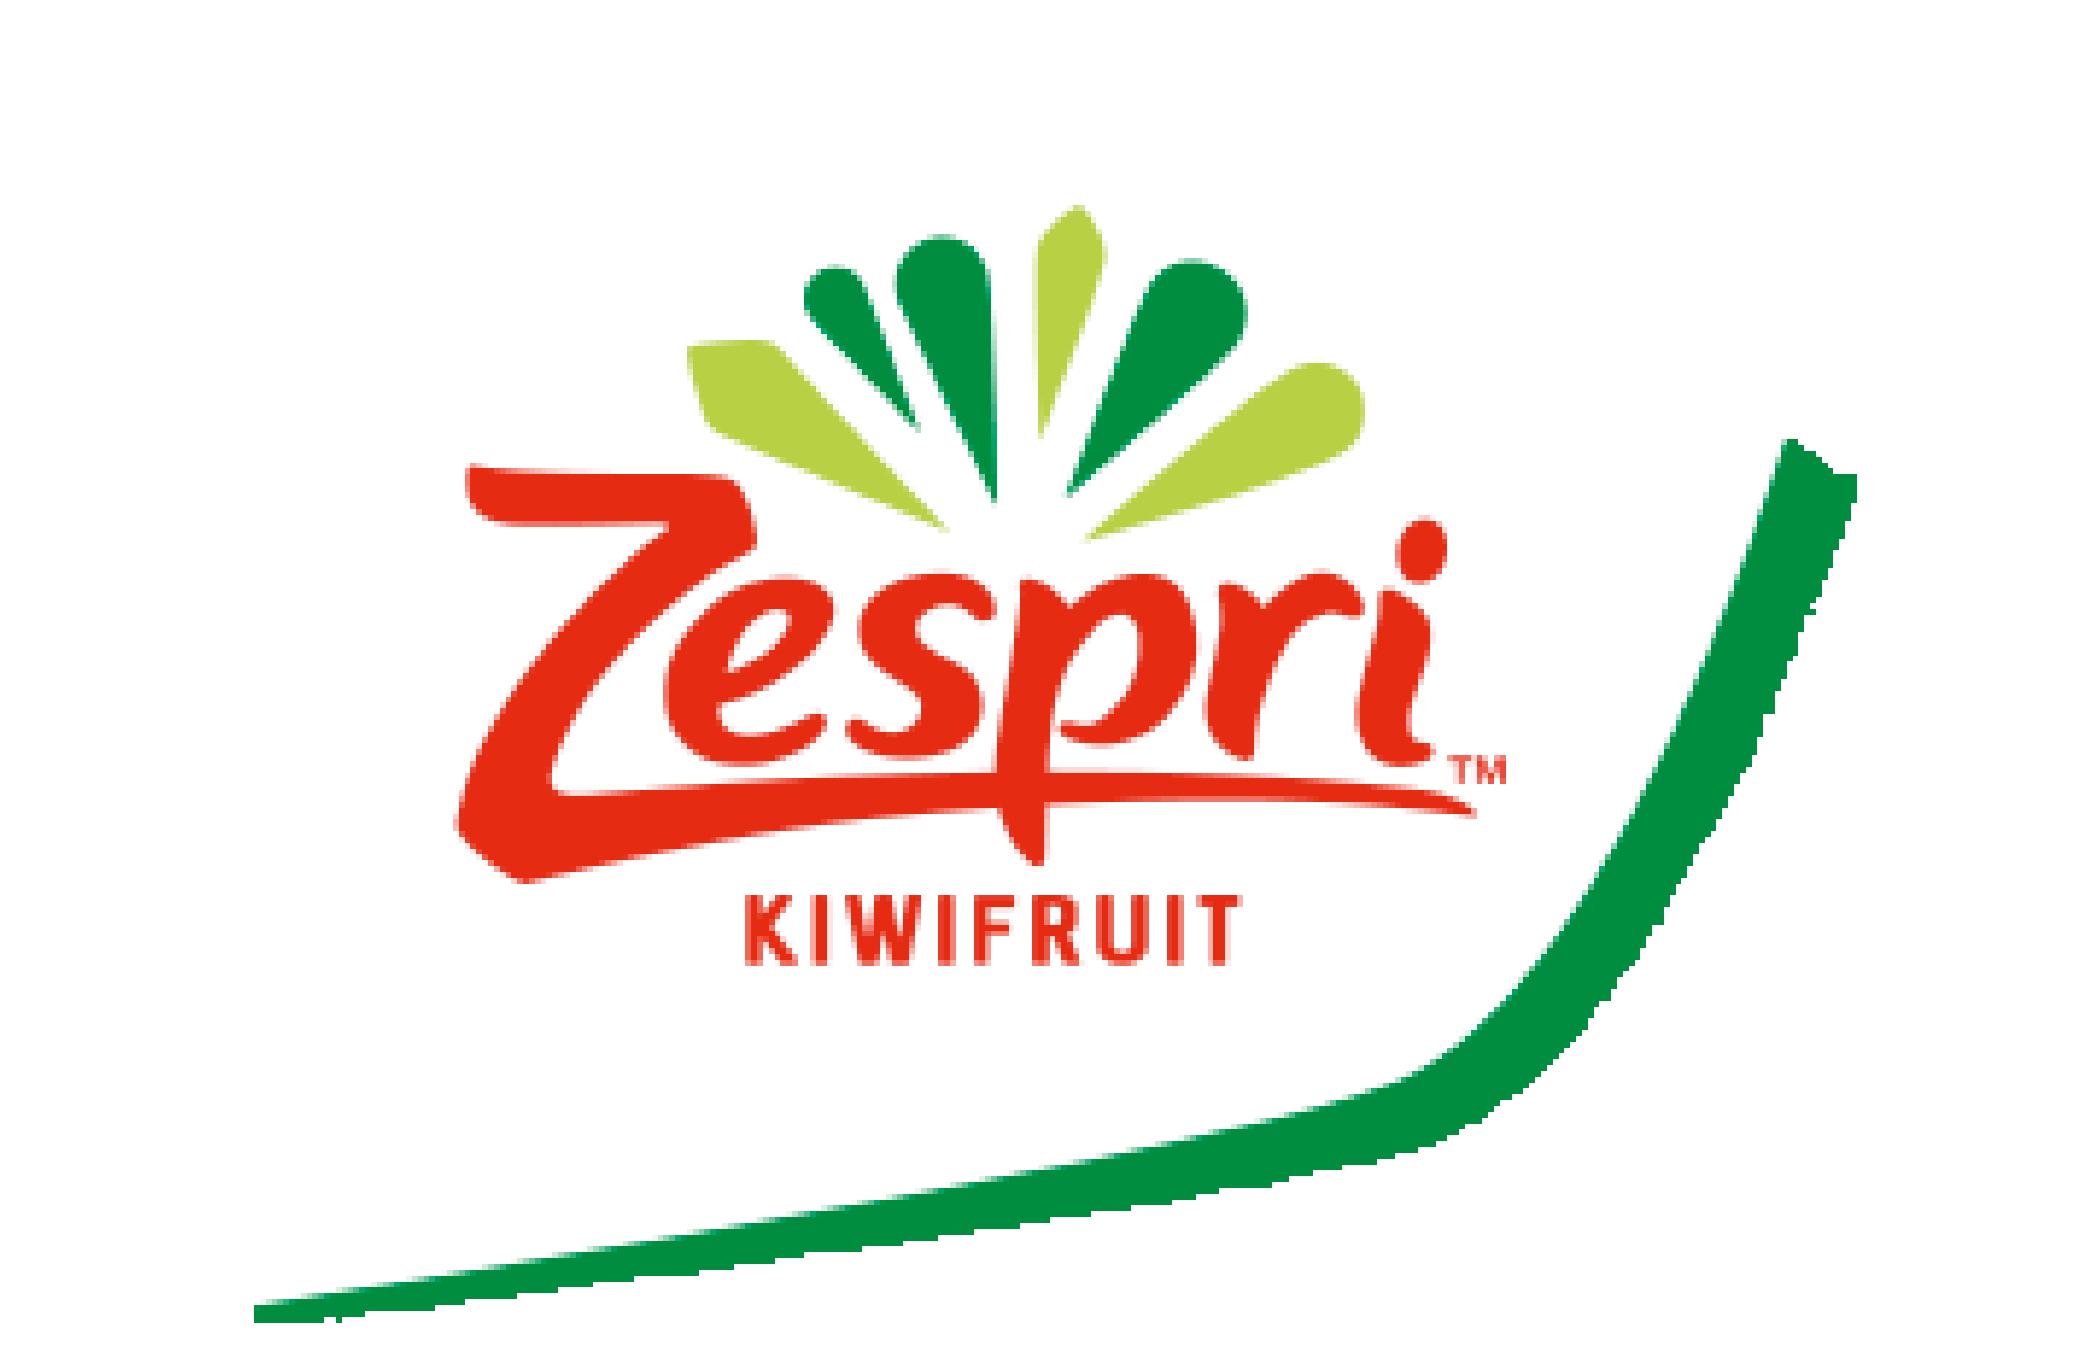 RLT__Zespri